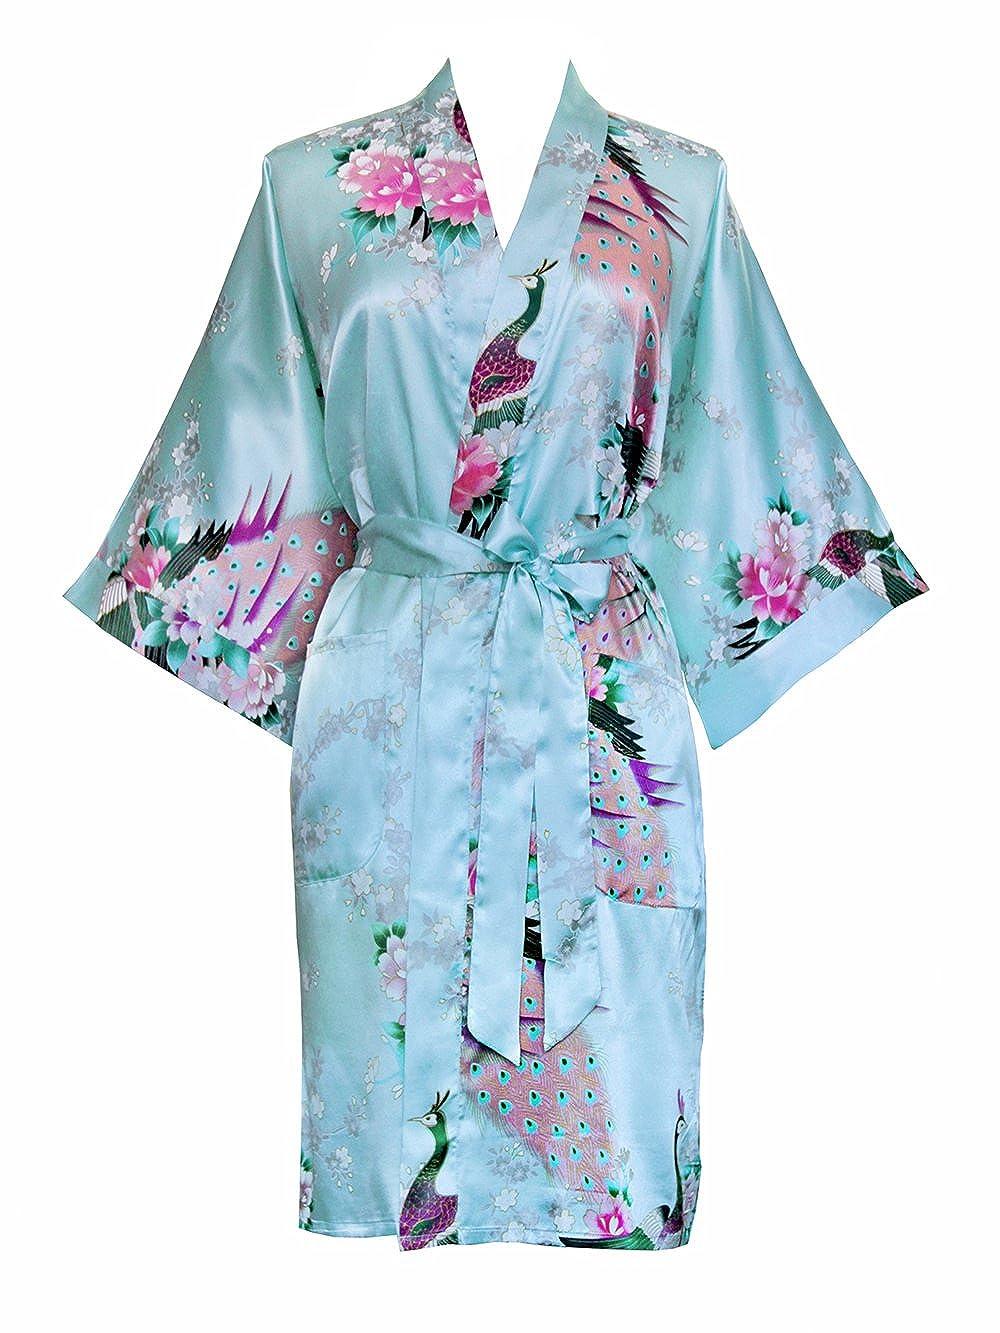 Old shanghai womens kimono short robe peacock blossoms aqua one size at  amazon womens clothing store 2c606c5e7